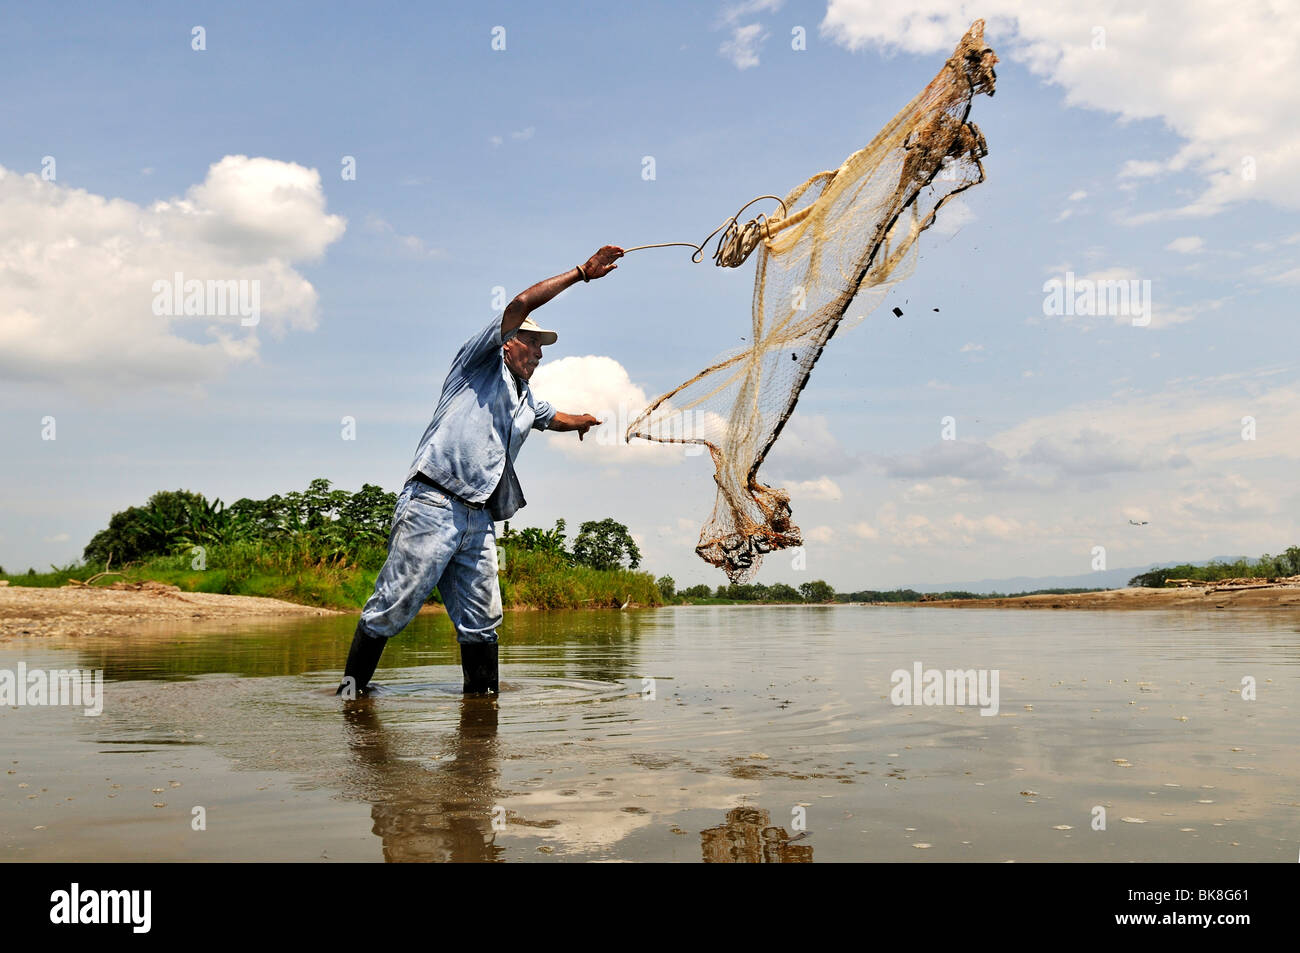 Fisherman tossing a net into the Rio Magdalena River, La Dorada, Caldas, Colombia, South America Stock Photo